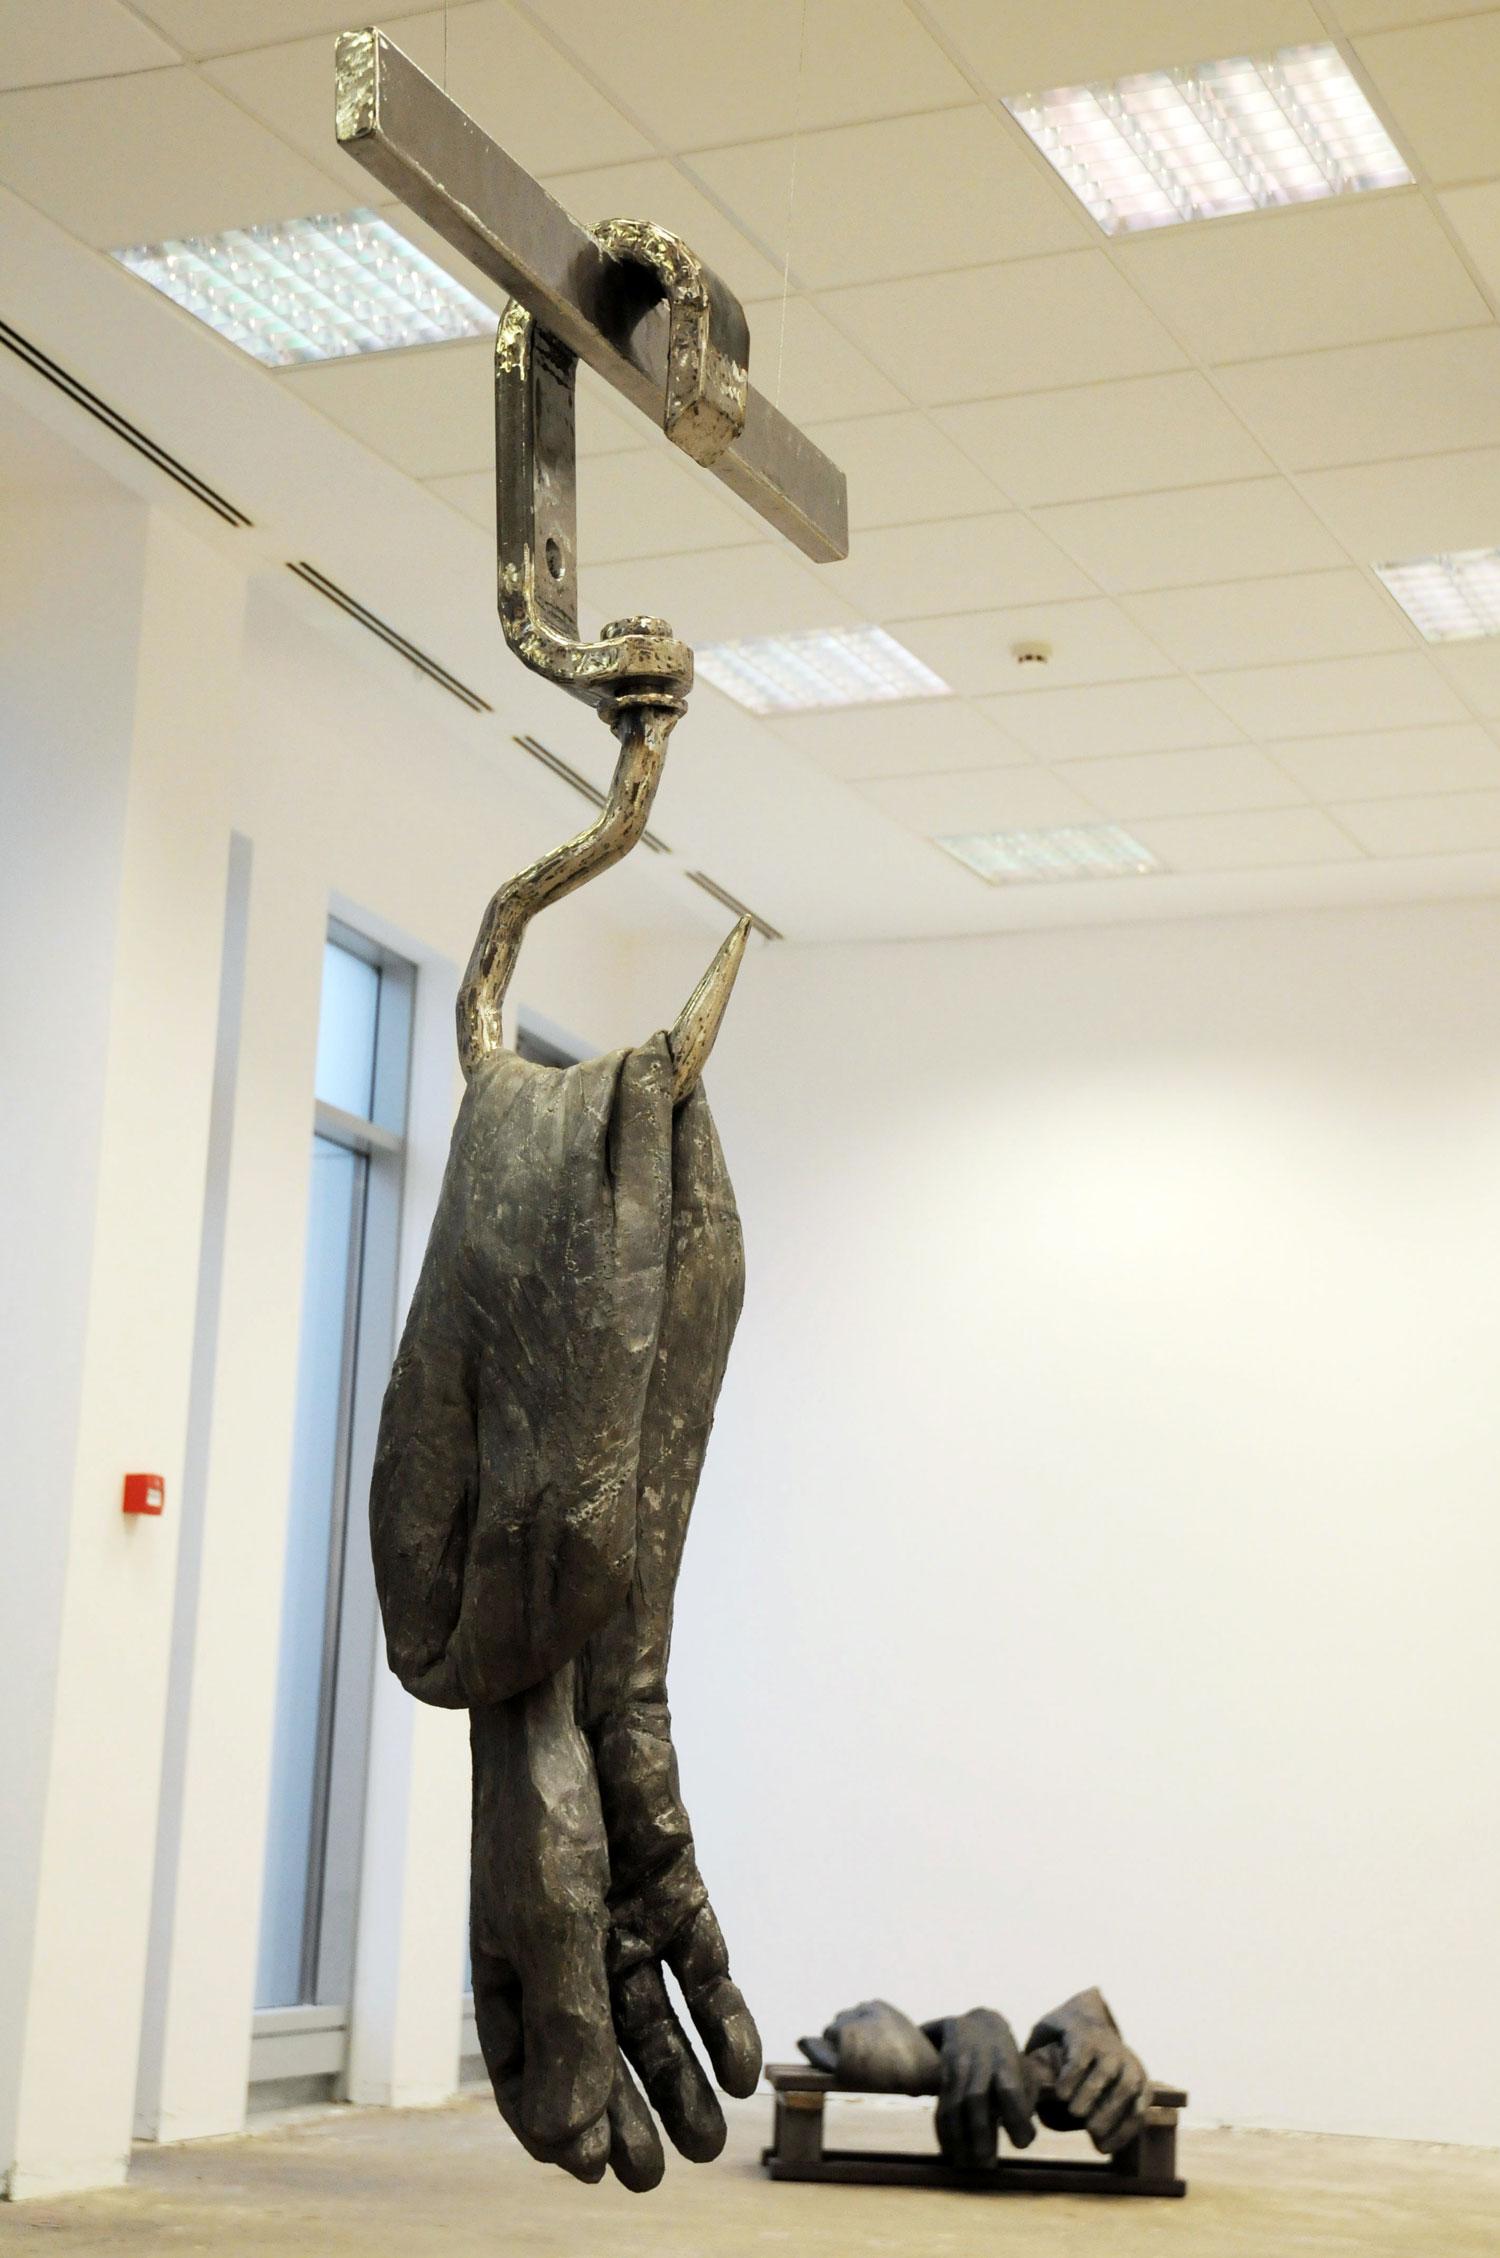 Catalin Badarau, Meat Me, 2015, Iron and silicone, 100 × 80 × 50 cm